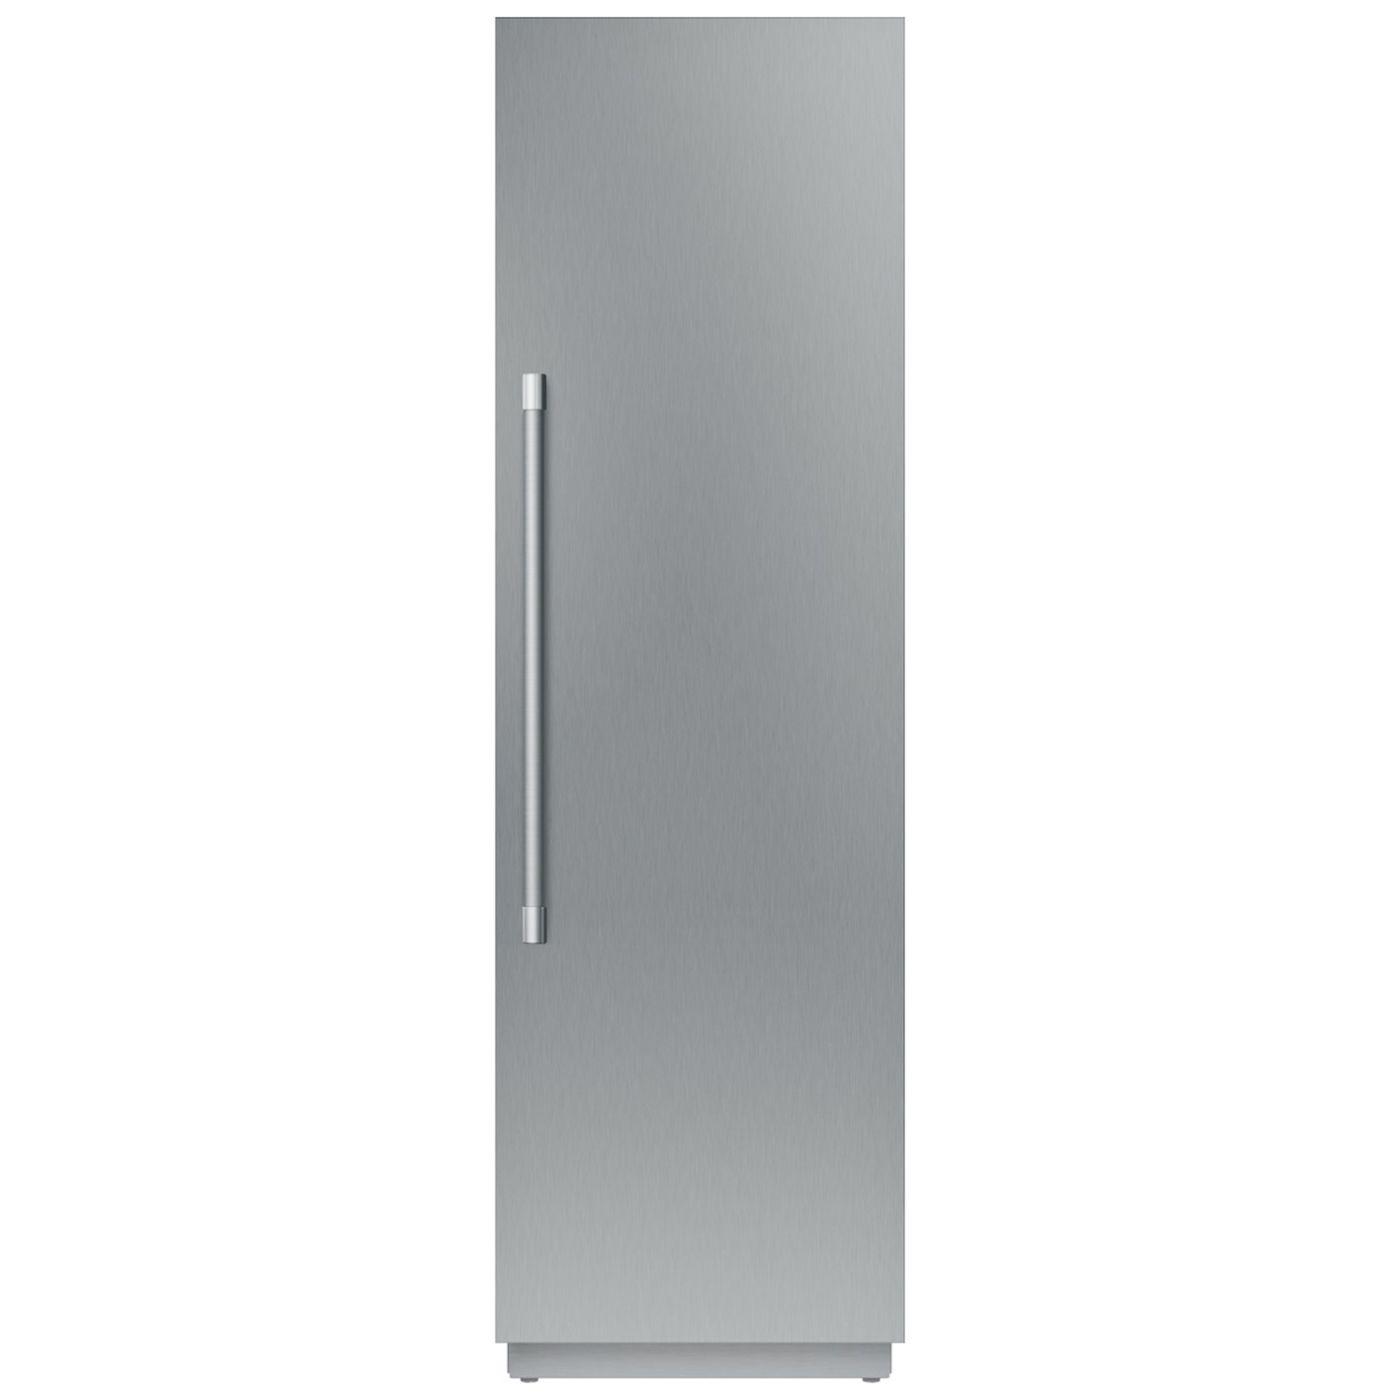 Thermador 24 Panel Ready Refrigerator Column T24IR900SP